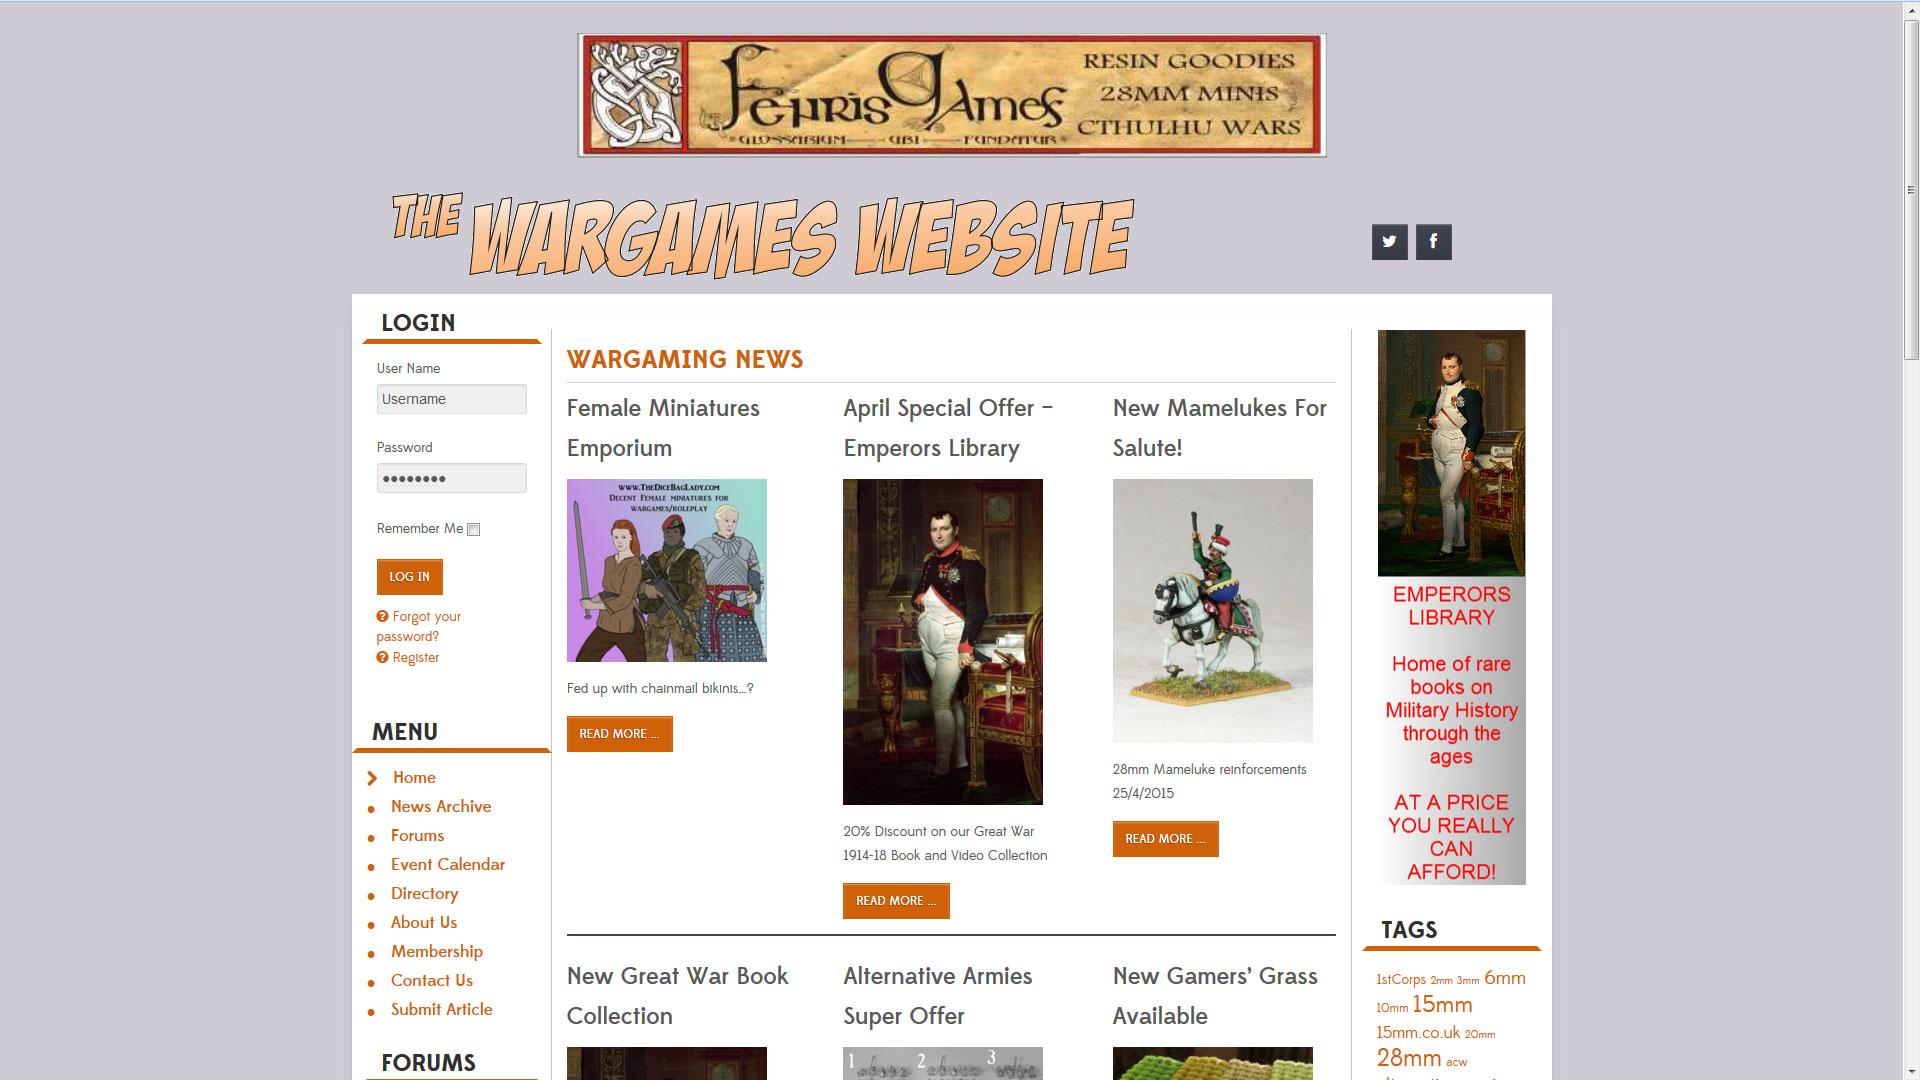 The Wargames Website